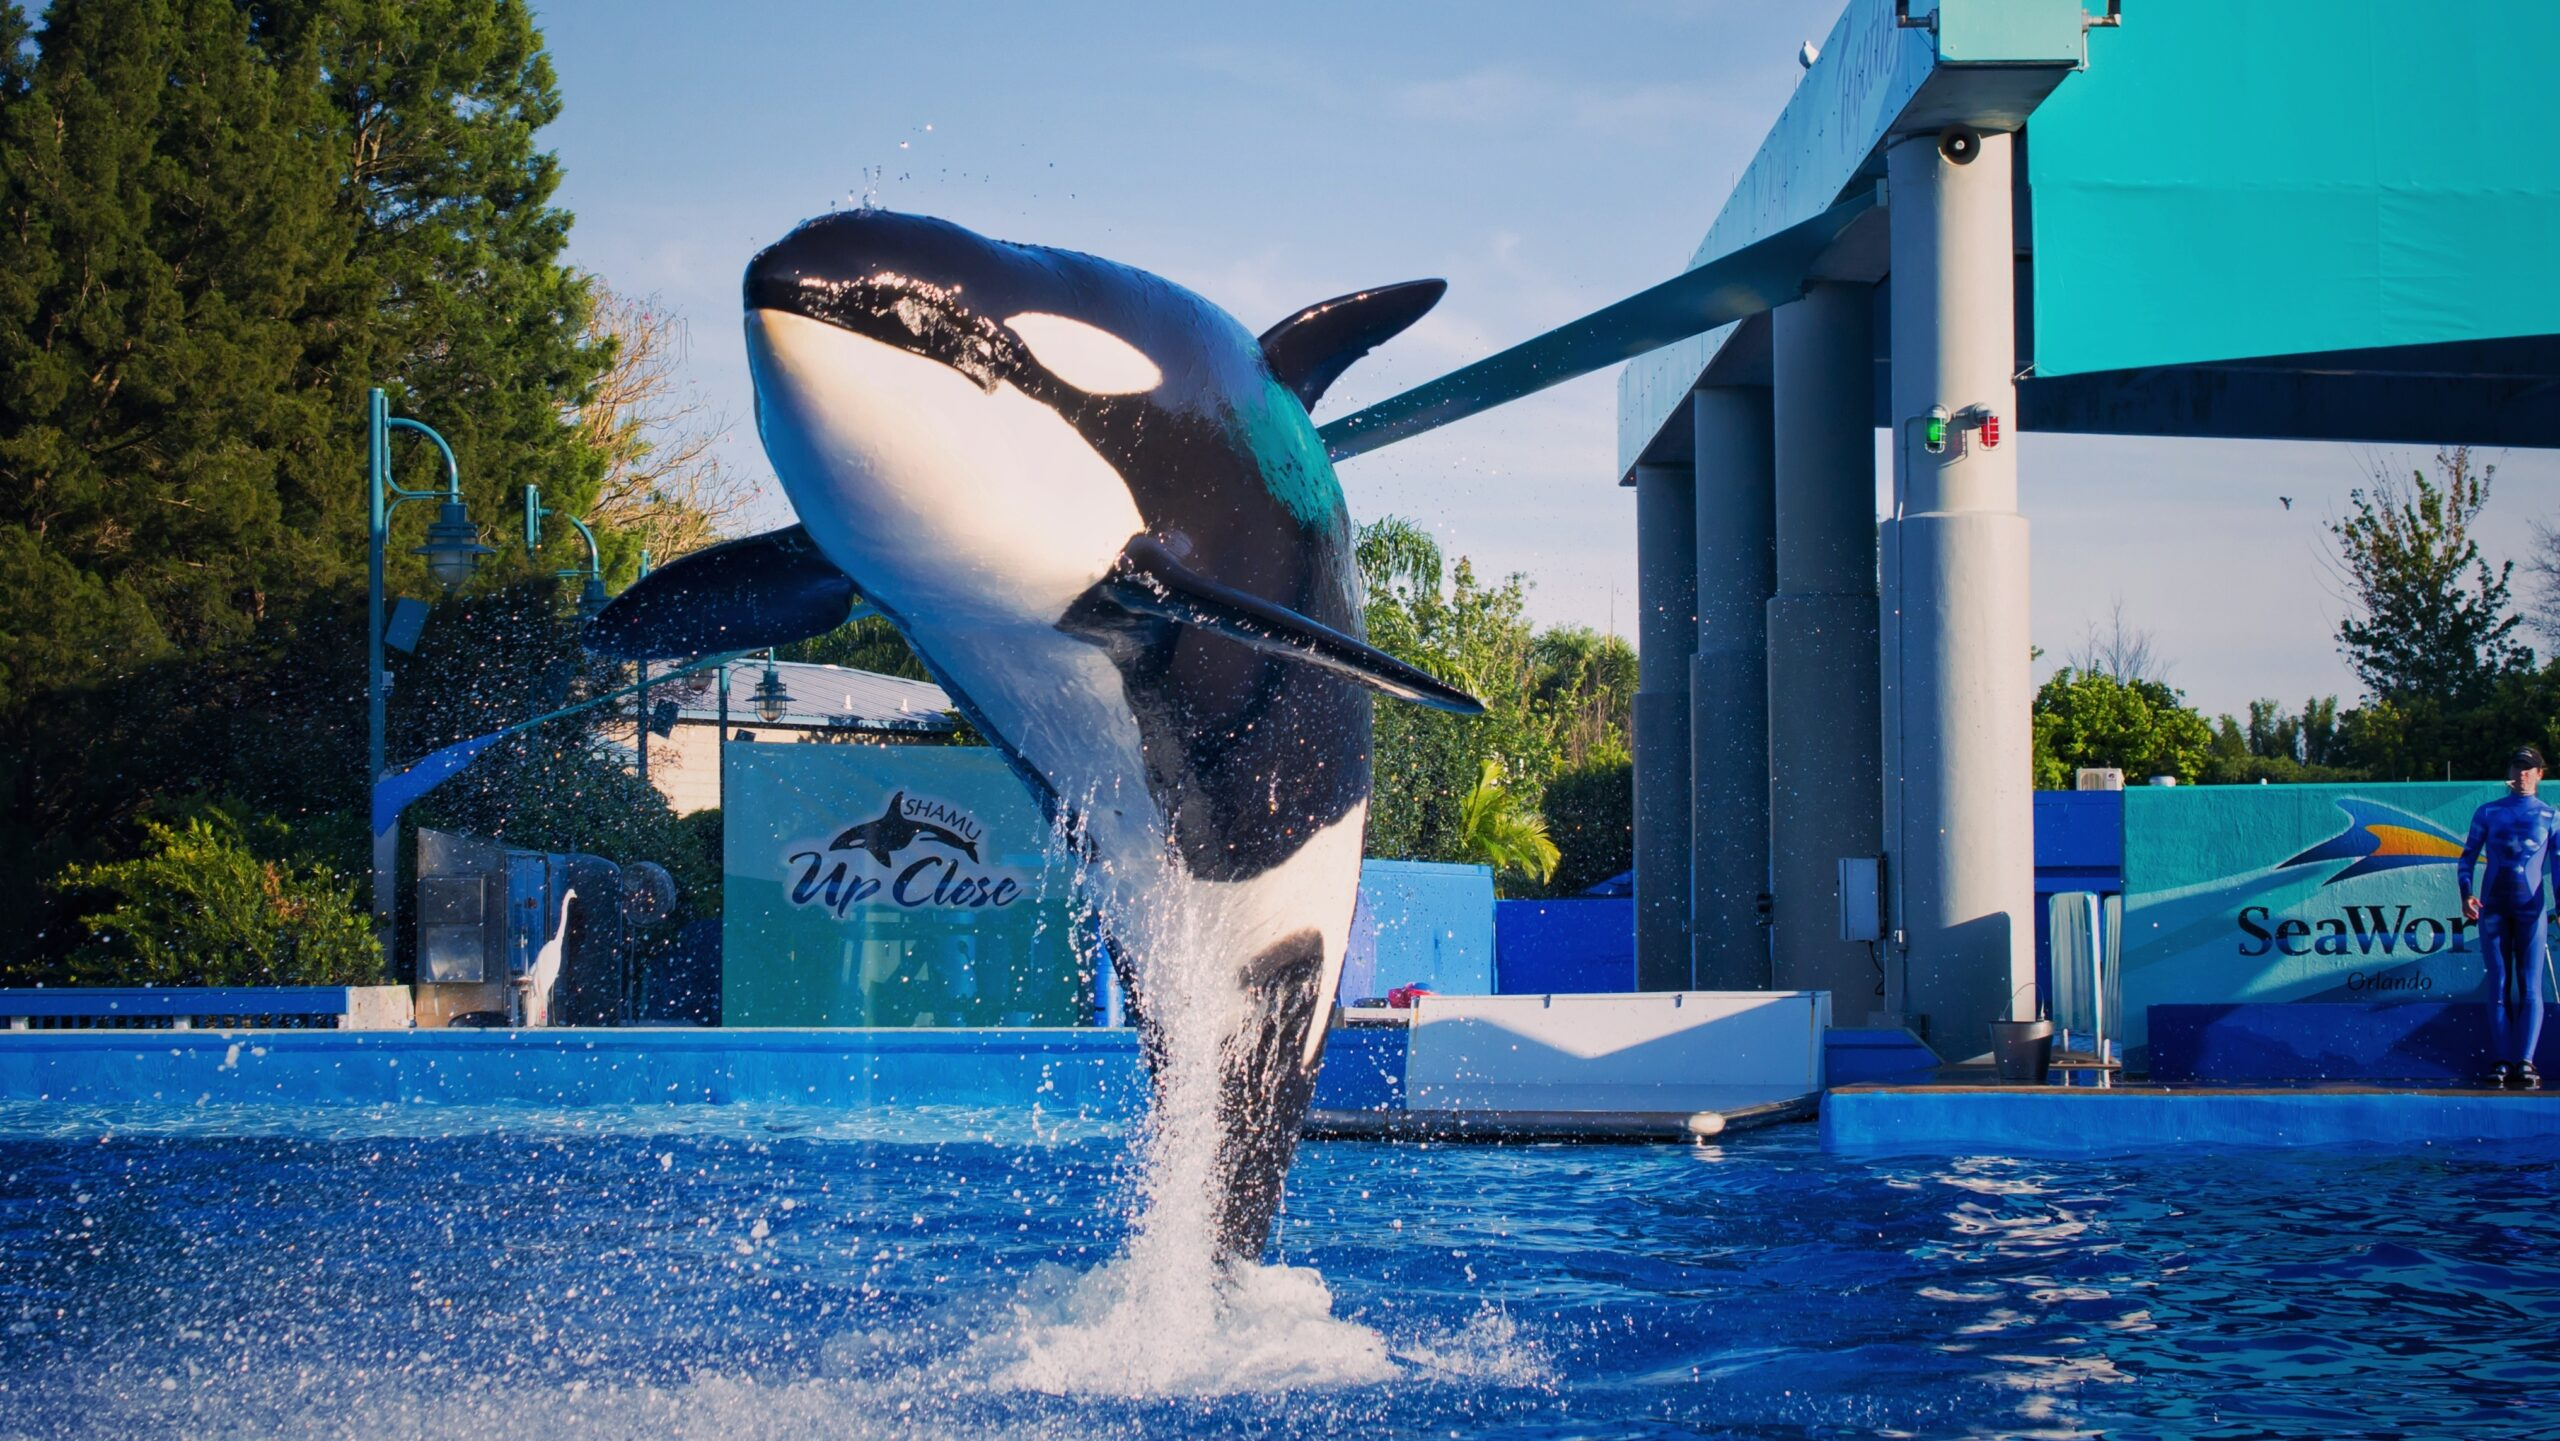 SeaWorld Orlando Attractions